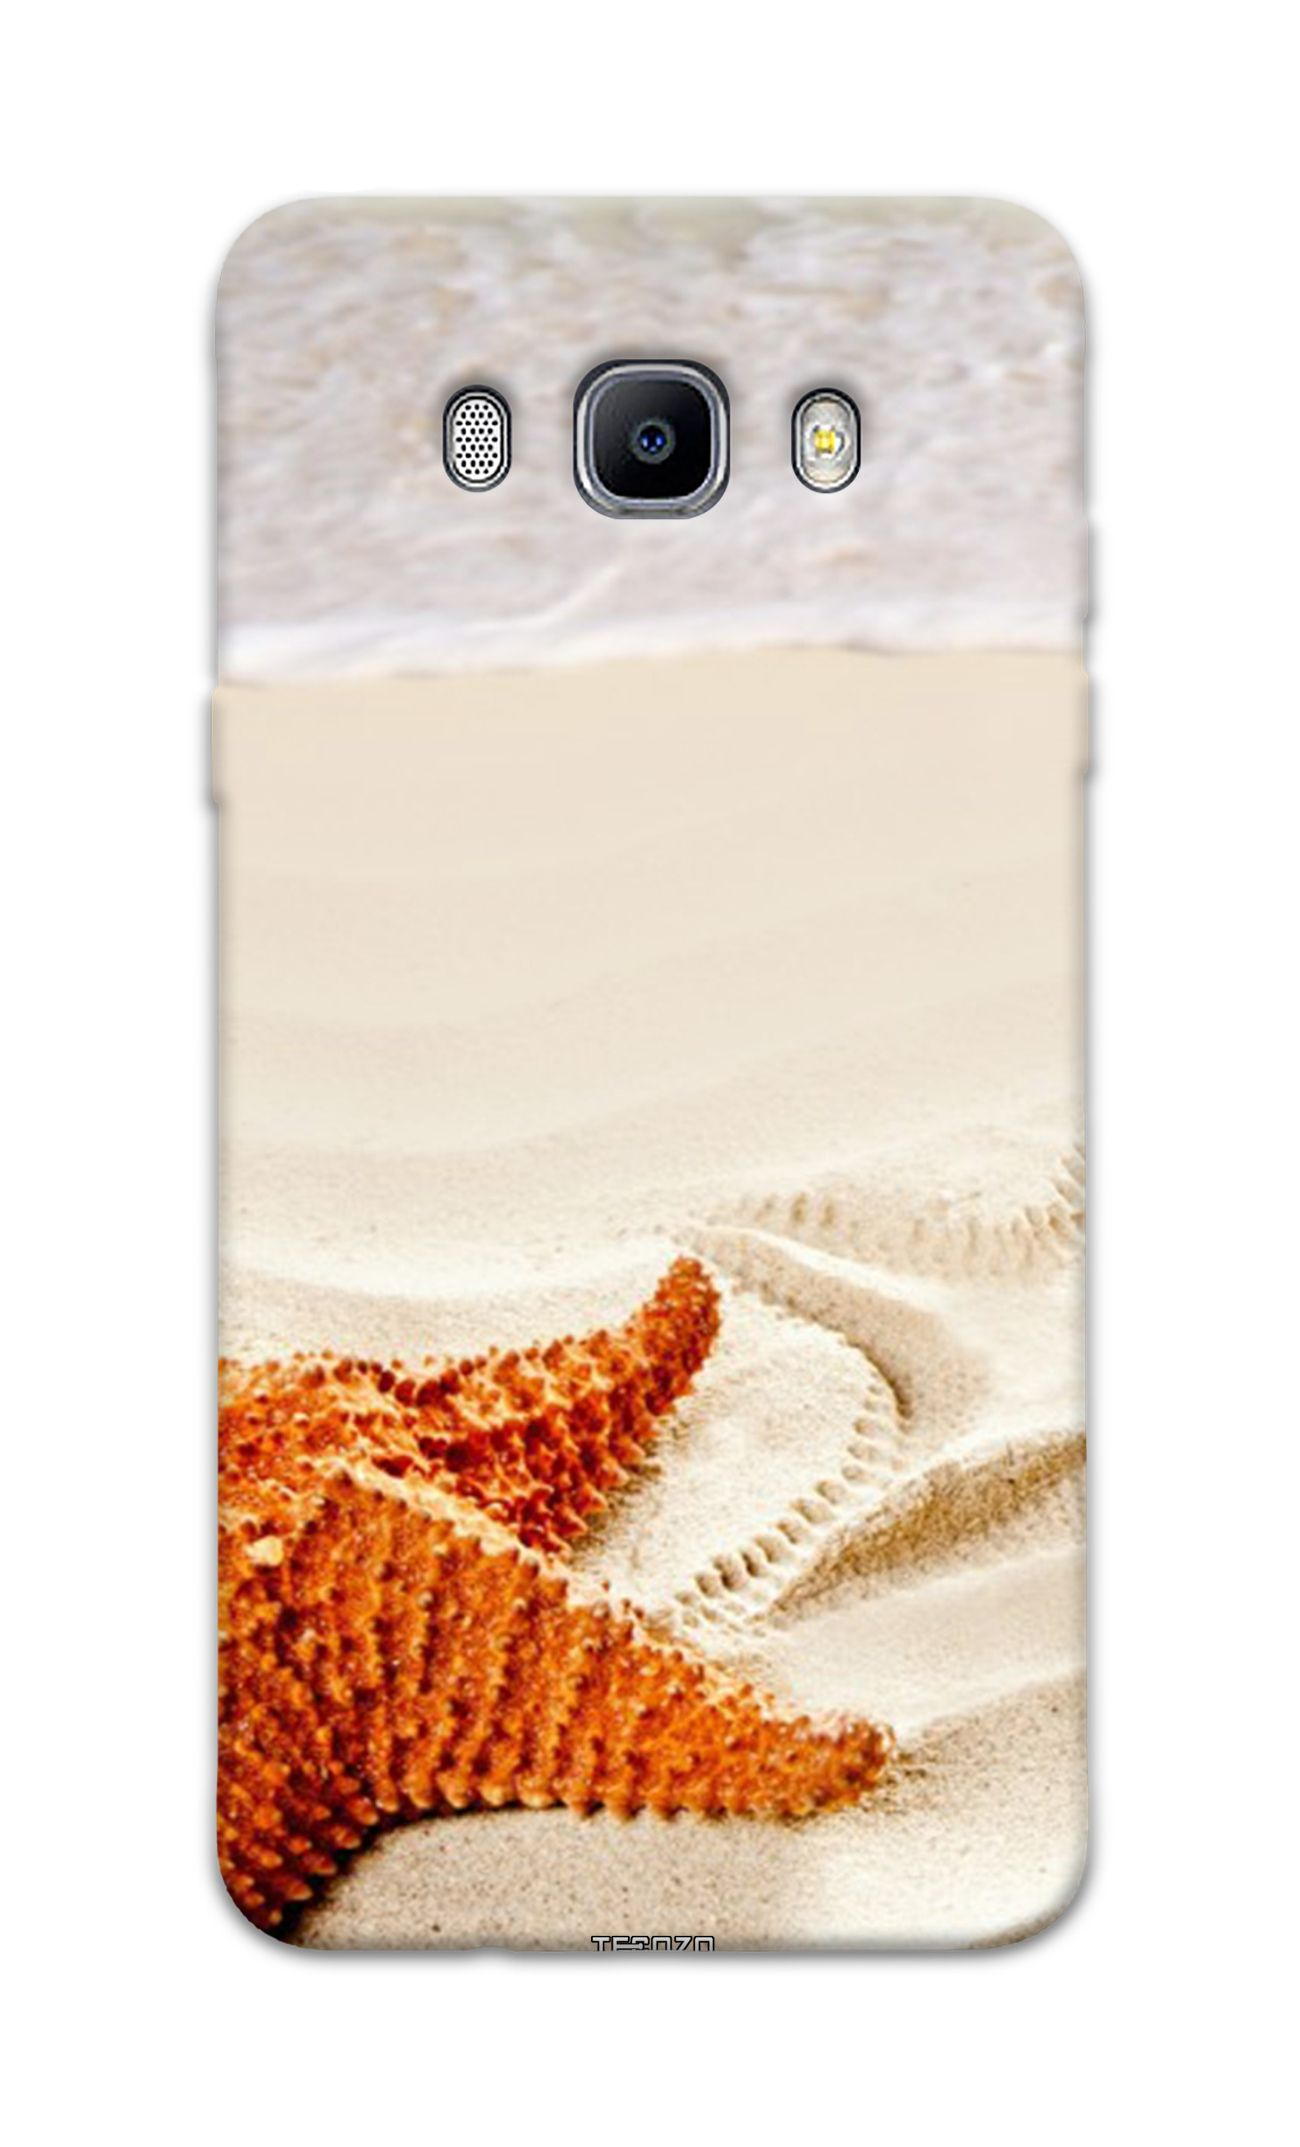 Samsung Galaxy J7 (2016) Printed Cover By Tecozo 3d Printed Cover